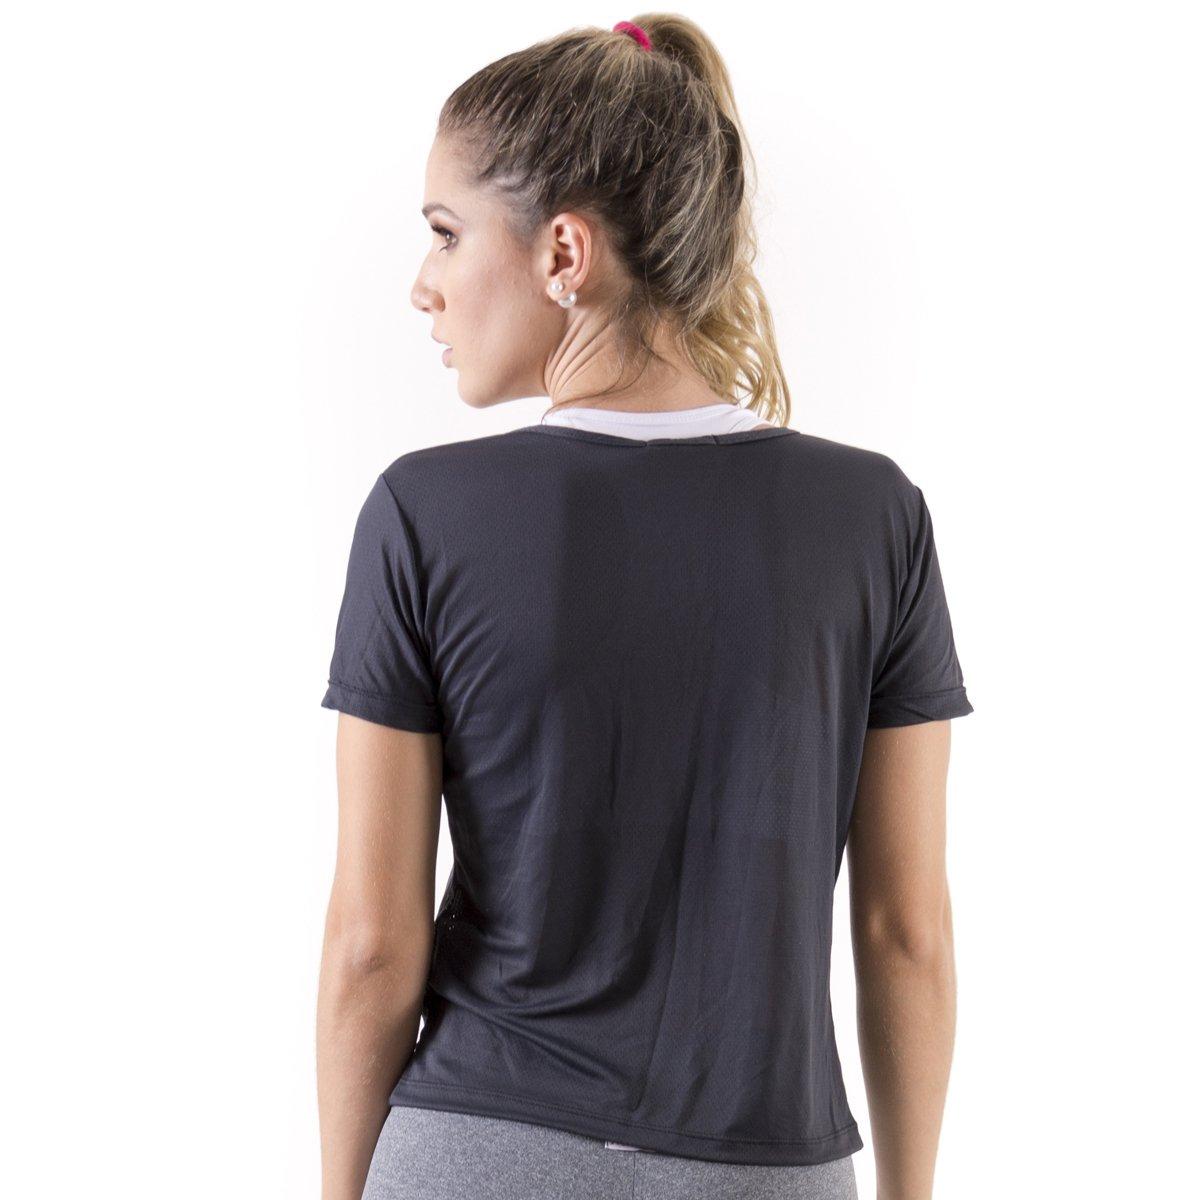 DryFit Preto Latina Camiseta Mama Camiseta Mama Effort nxBHZt